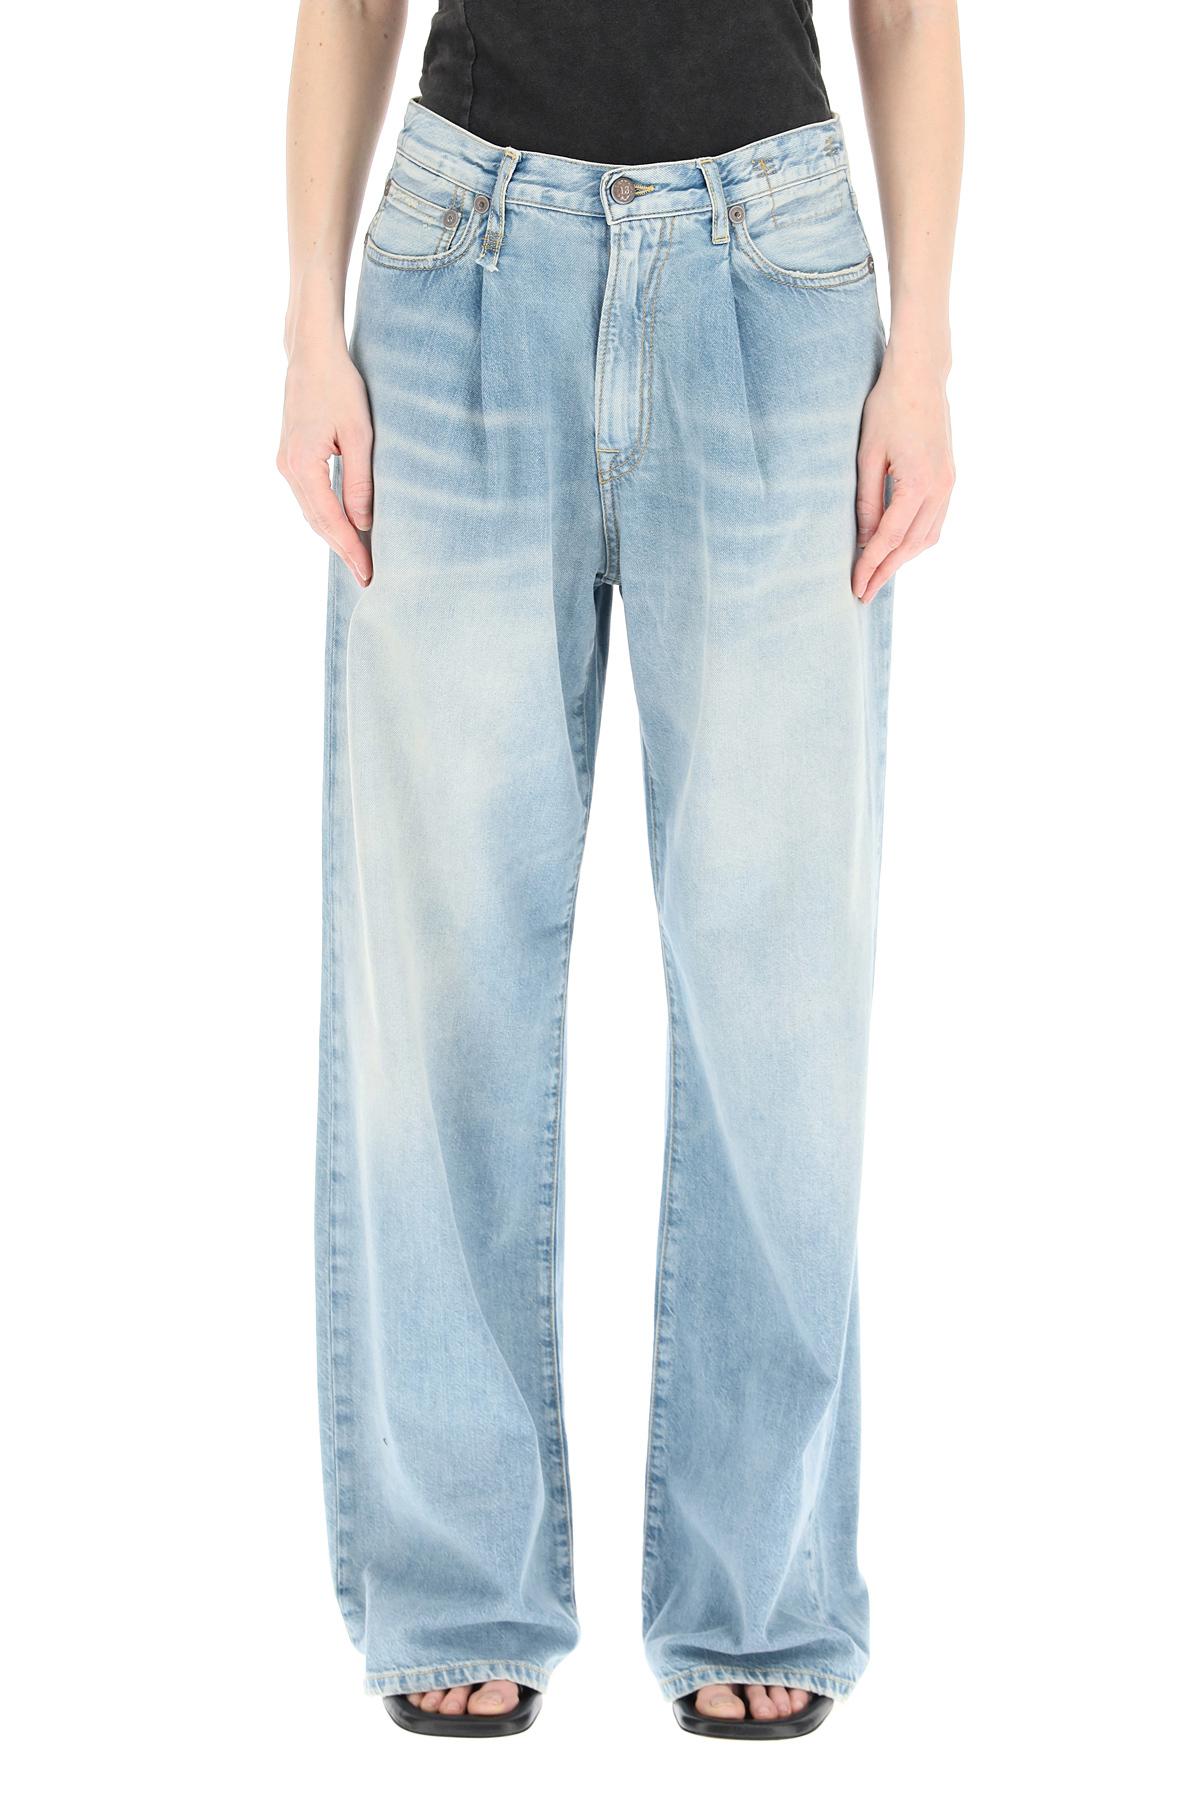 R13 jeans damon vintage indaco